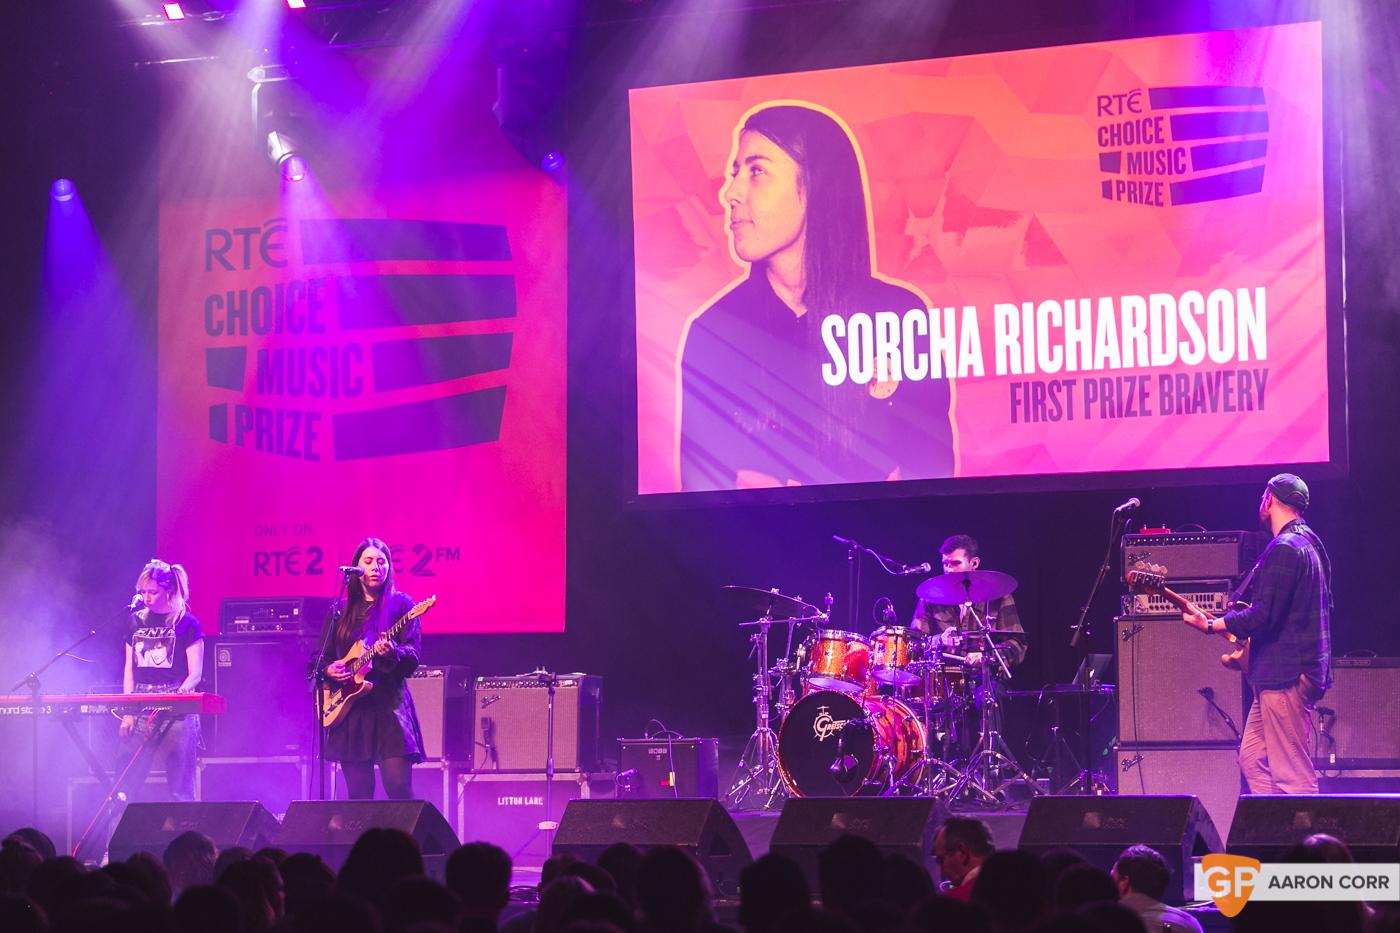 Sorcha Richardson at Choice Music Prize 2020 in Vicar Street, Dublin on 05-Mar-20 by Aaron Corr-5281